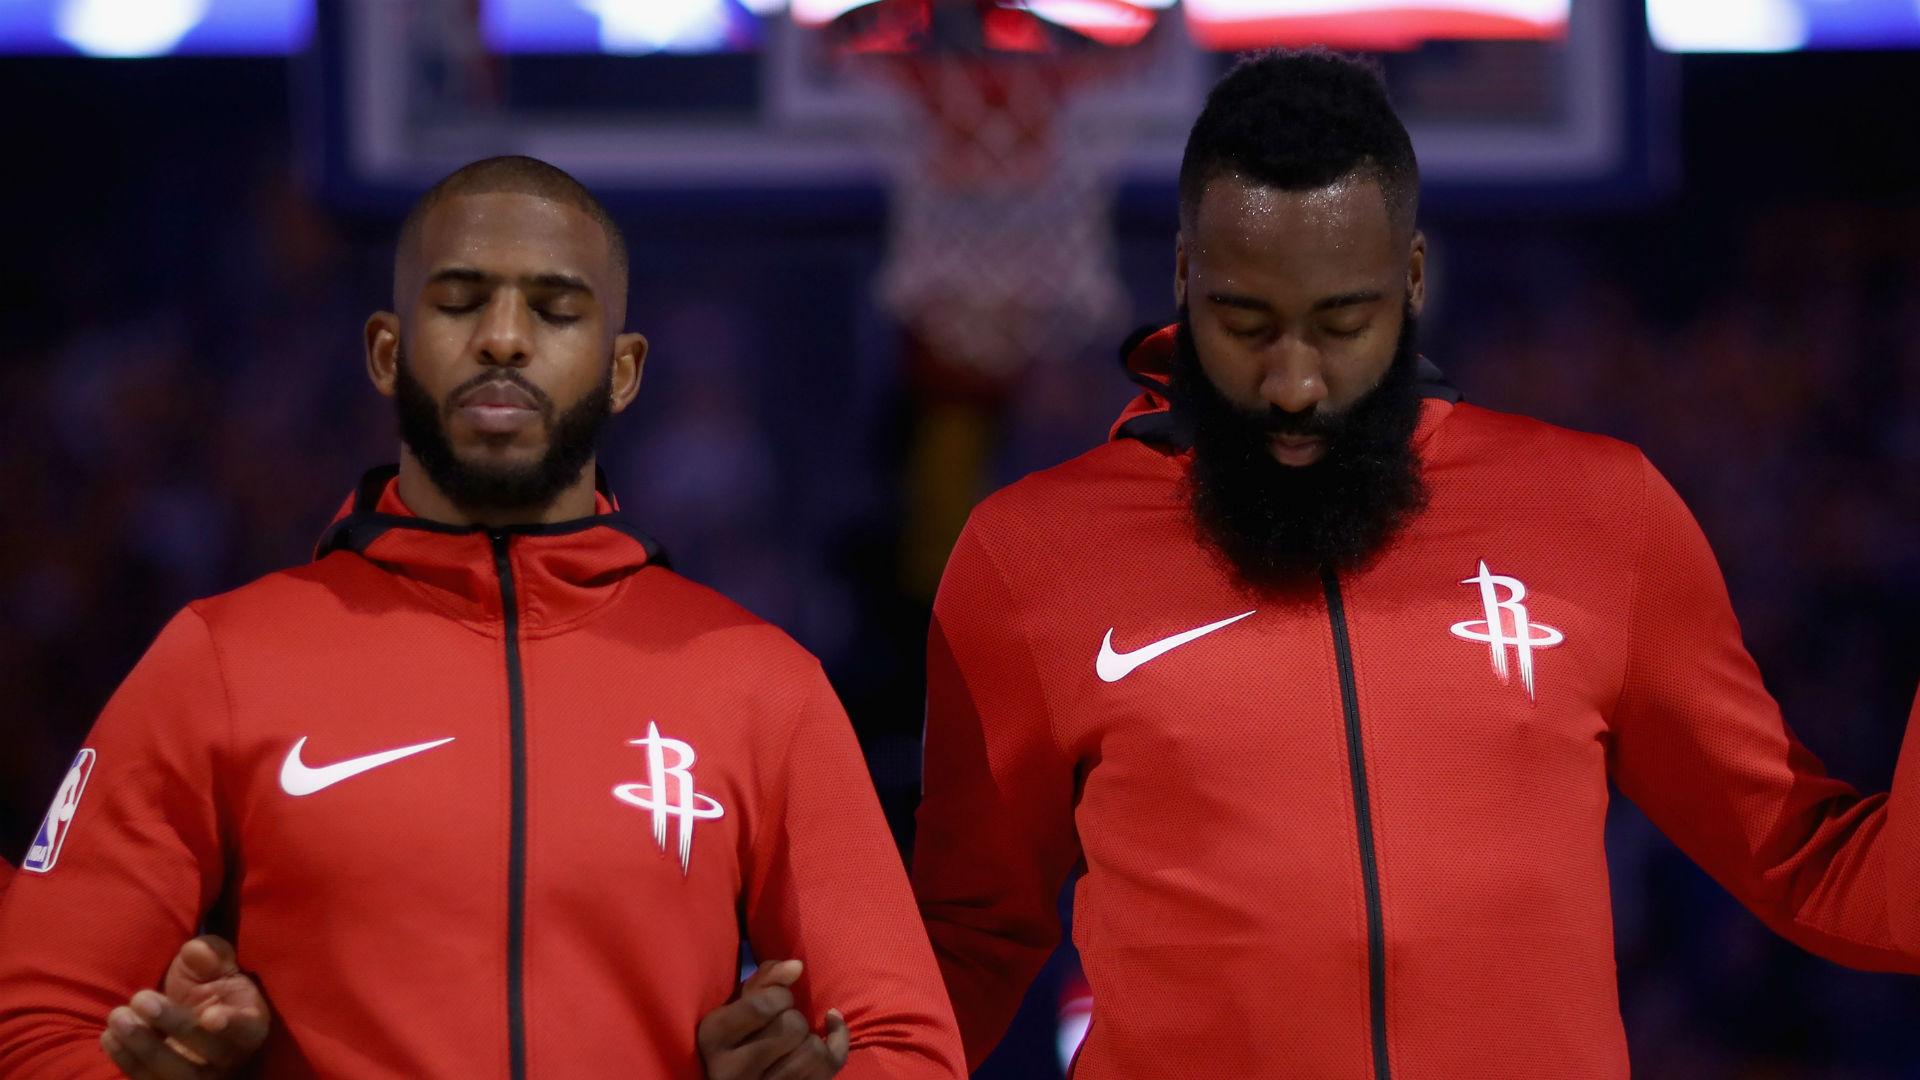 Rockets guard Chris Paul has a message to James Harden's critics